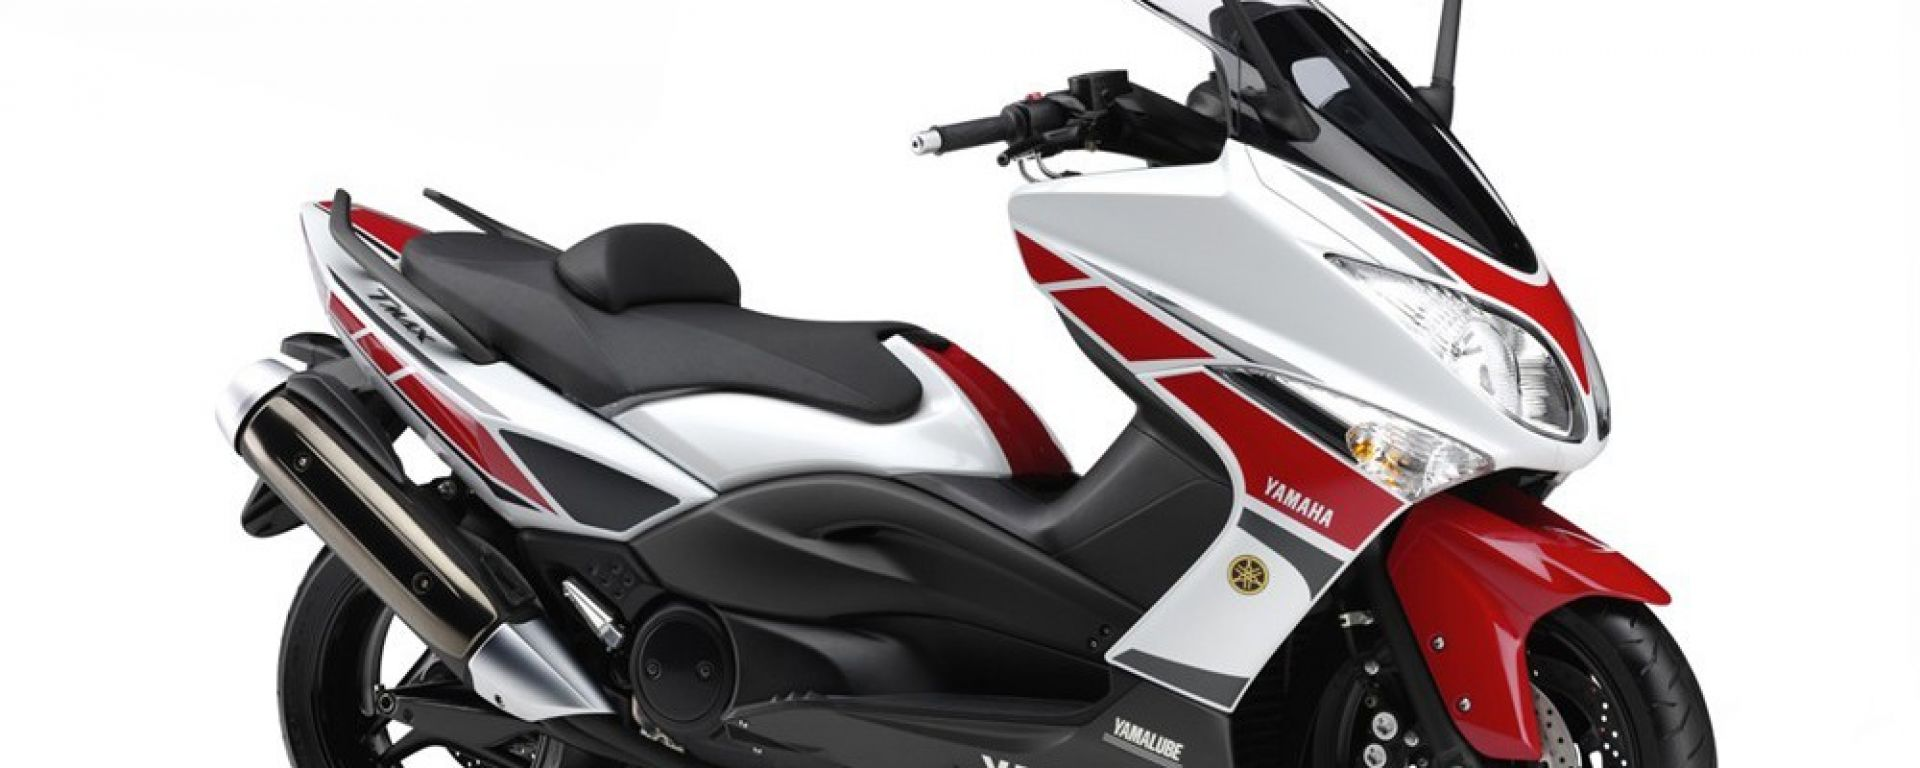 Yamaha Tmax Anniversary Edition